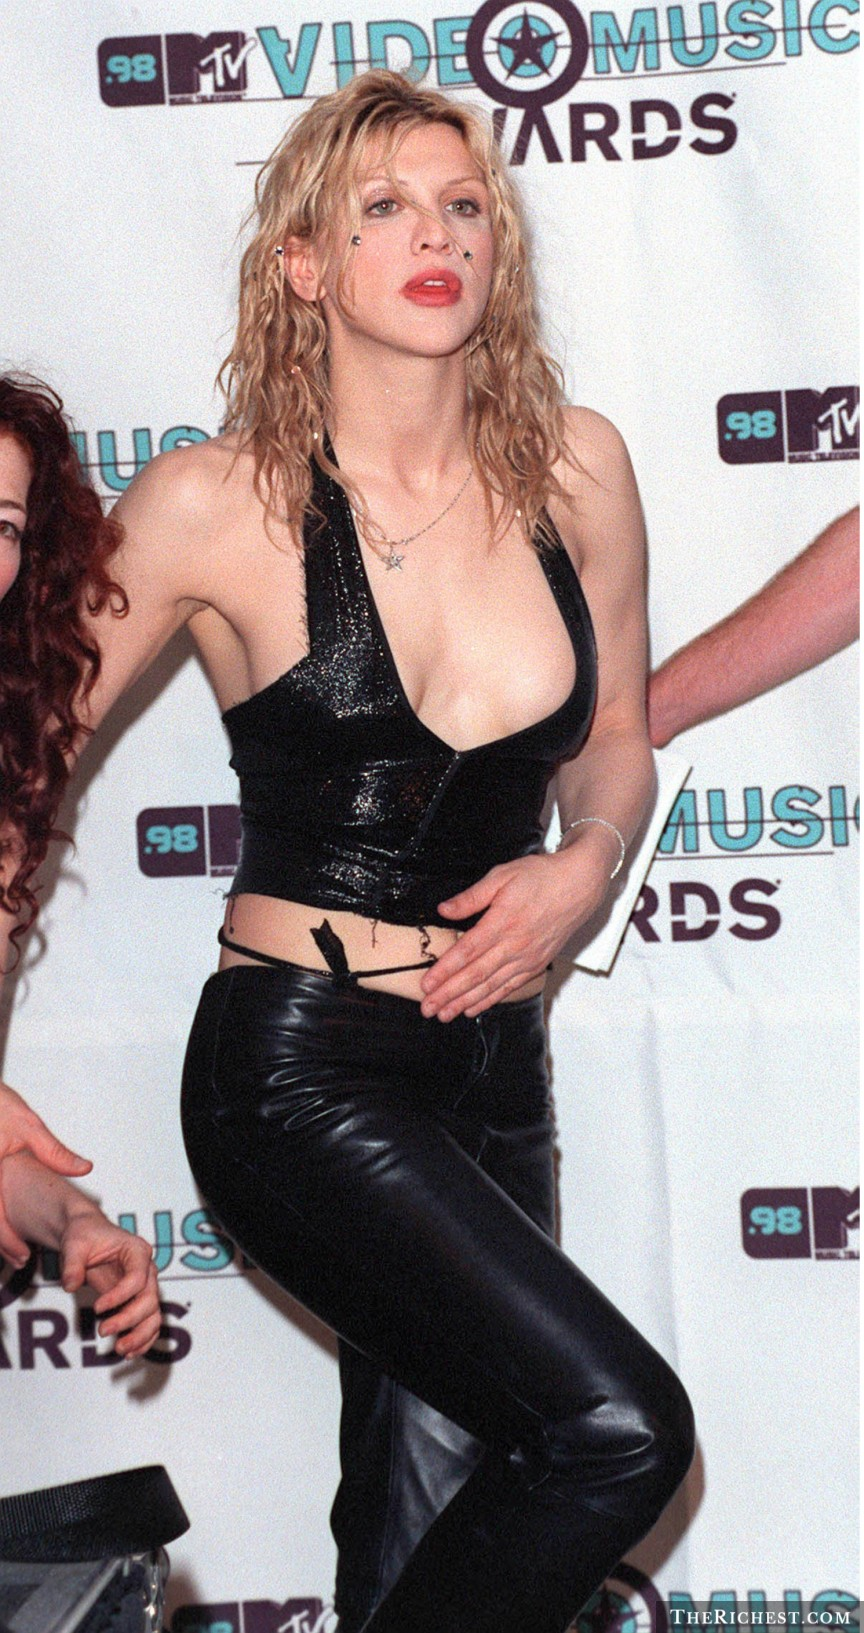 7. 寇特妮·洛芙(Courtney Love)